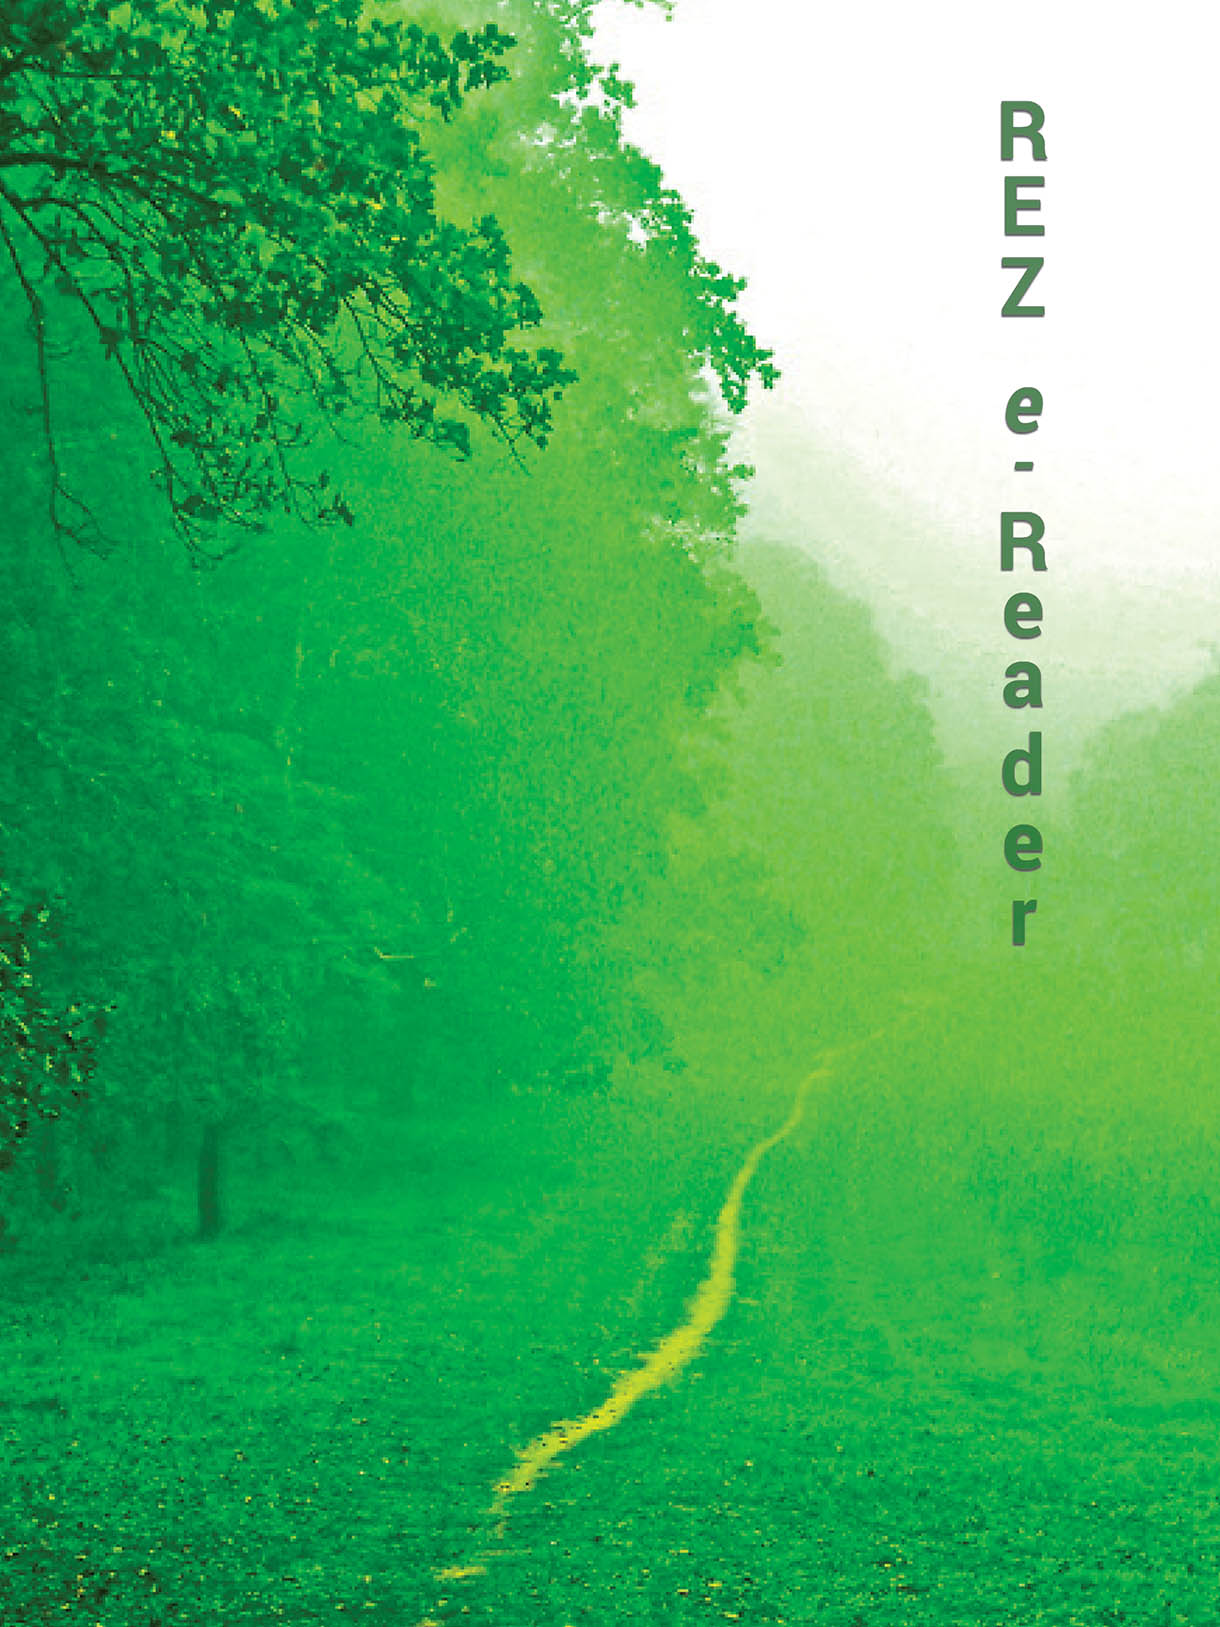 REZ Reading Series